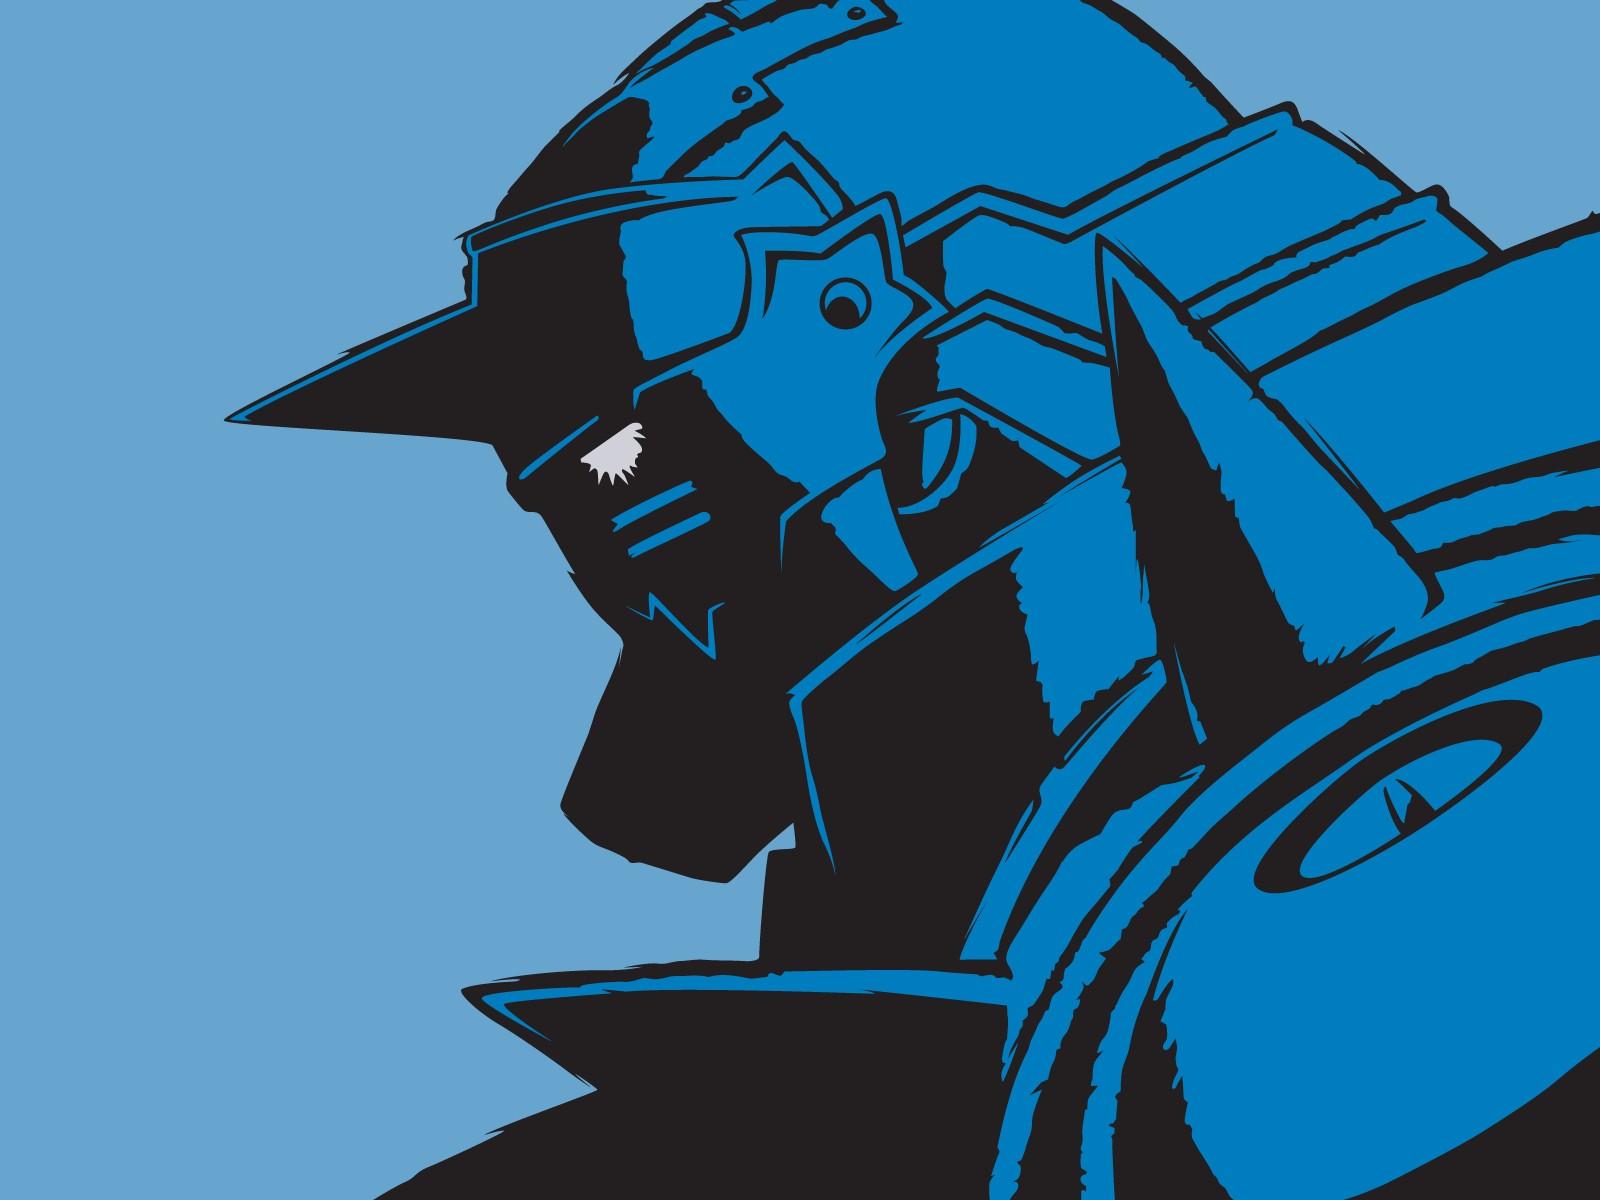 Drawing Illustration Minimalism Cartoon Armor Full Metal Alchemist Elric Alphonse ART Sketch